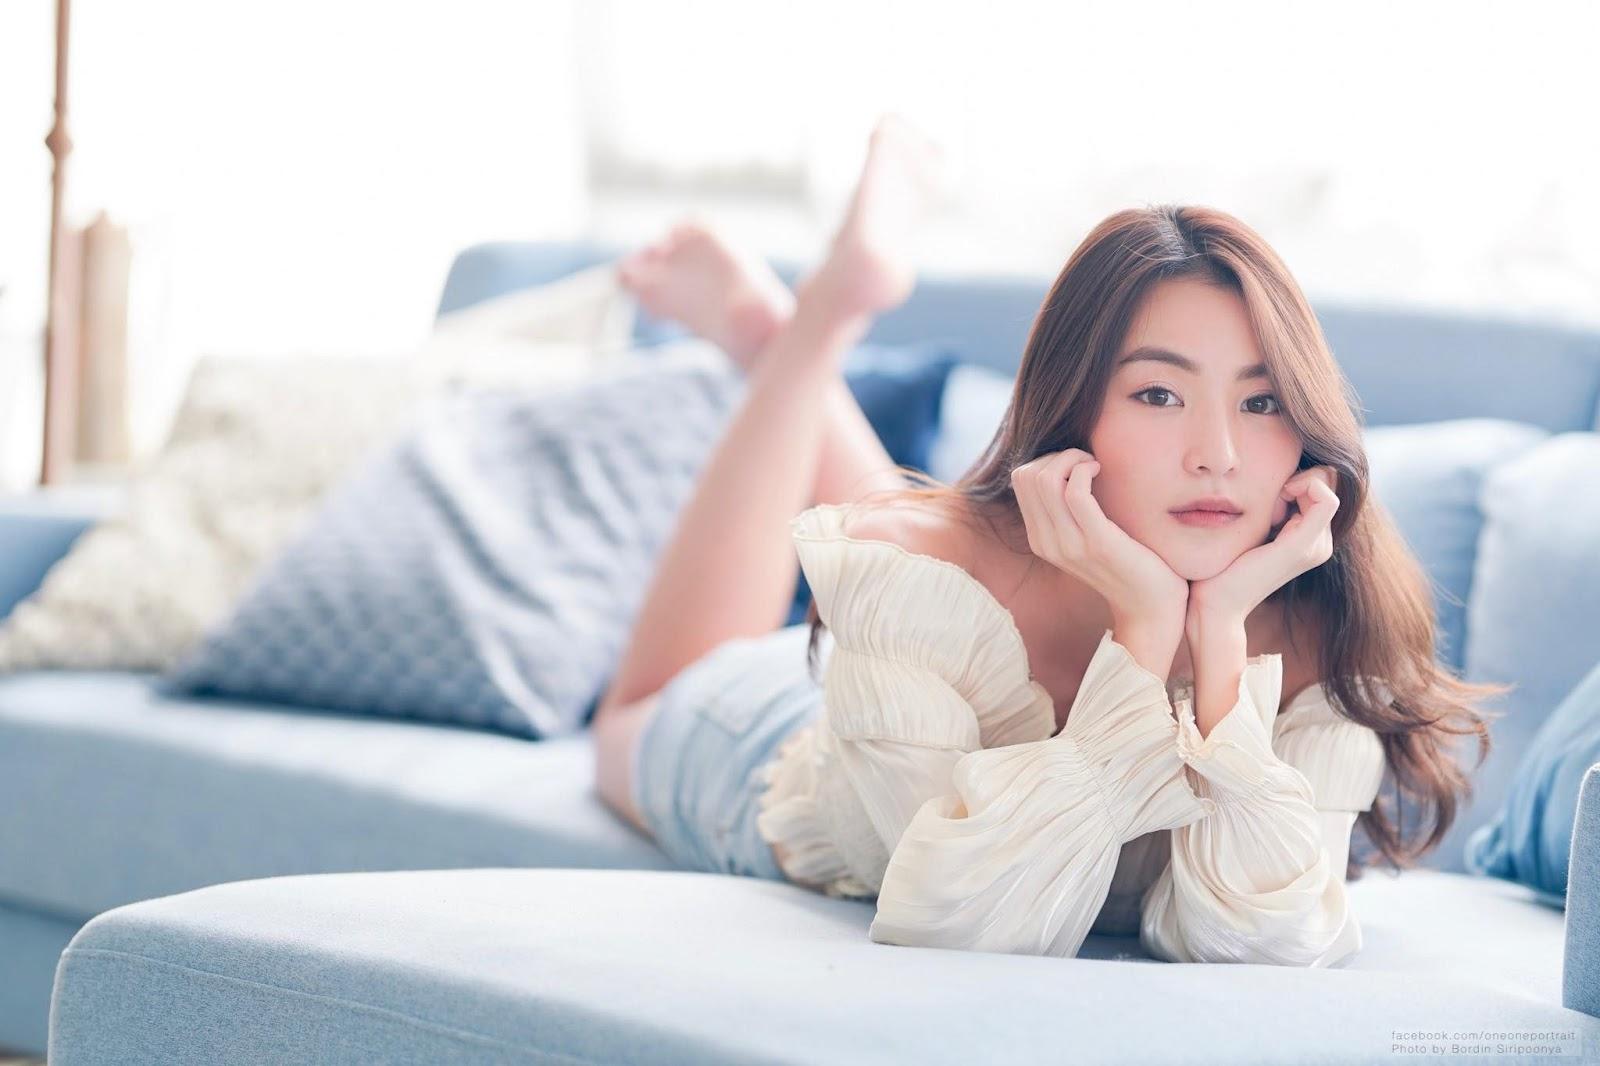 Beauty Thailand Kapook Phatchara vs Photo album Love you 3000 - Picture 9